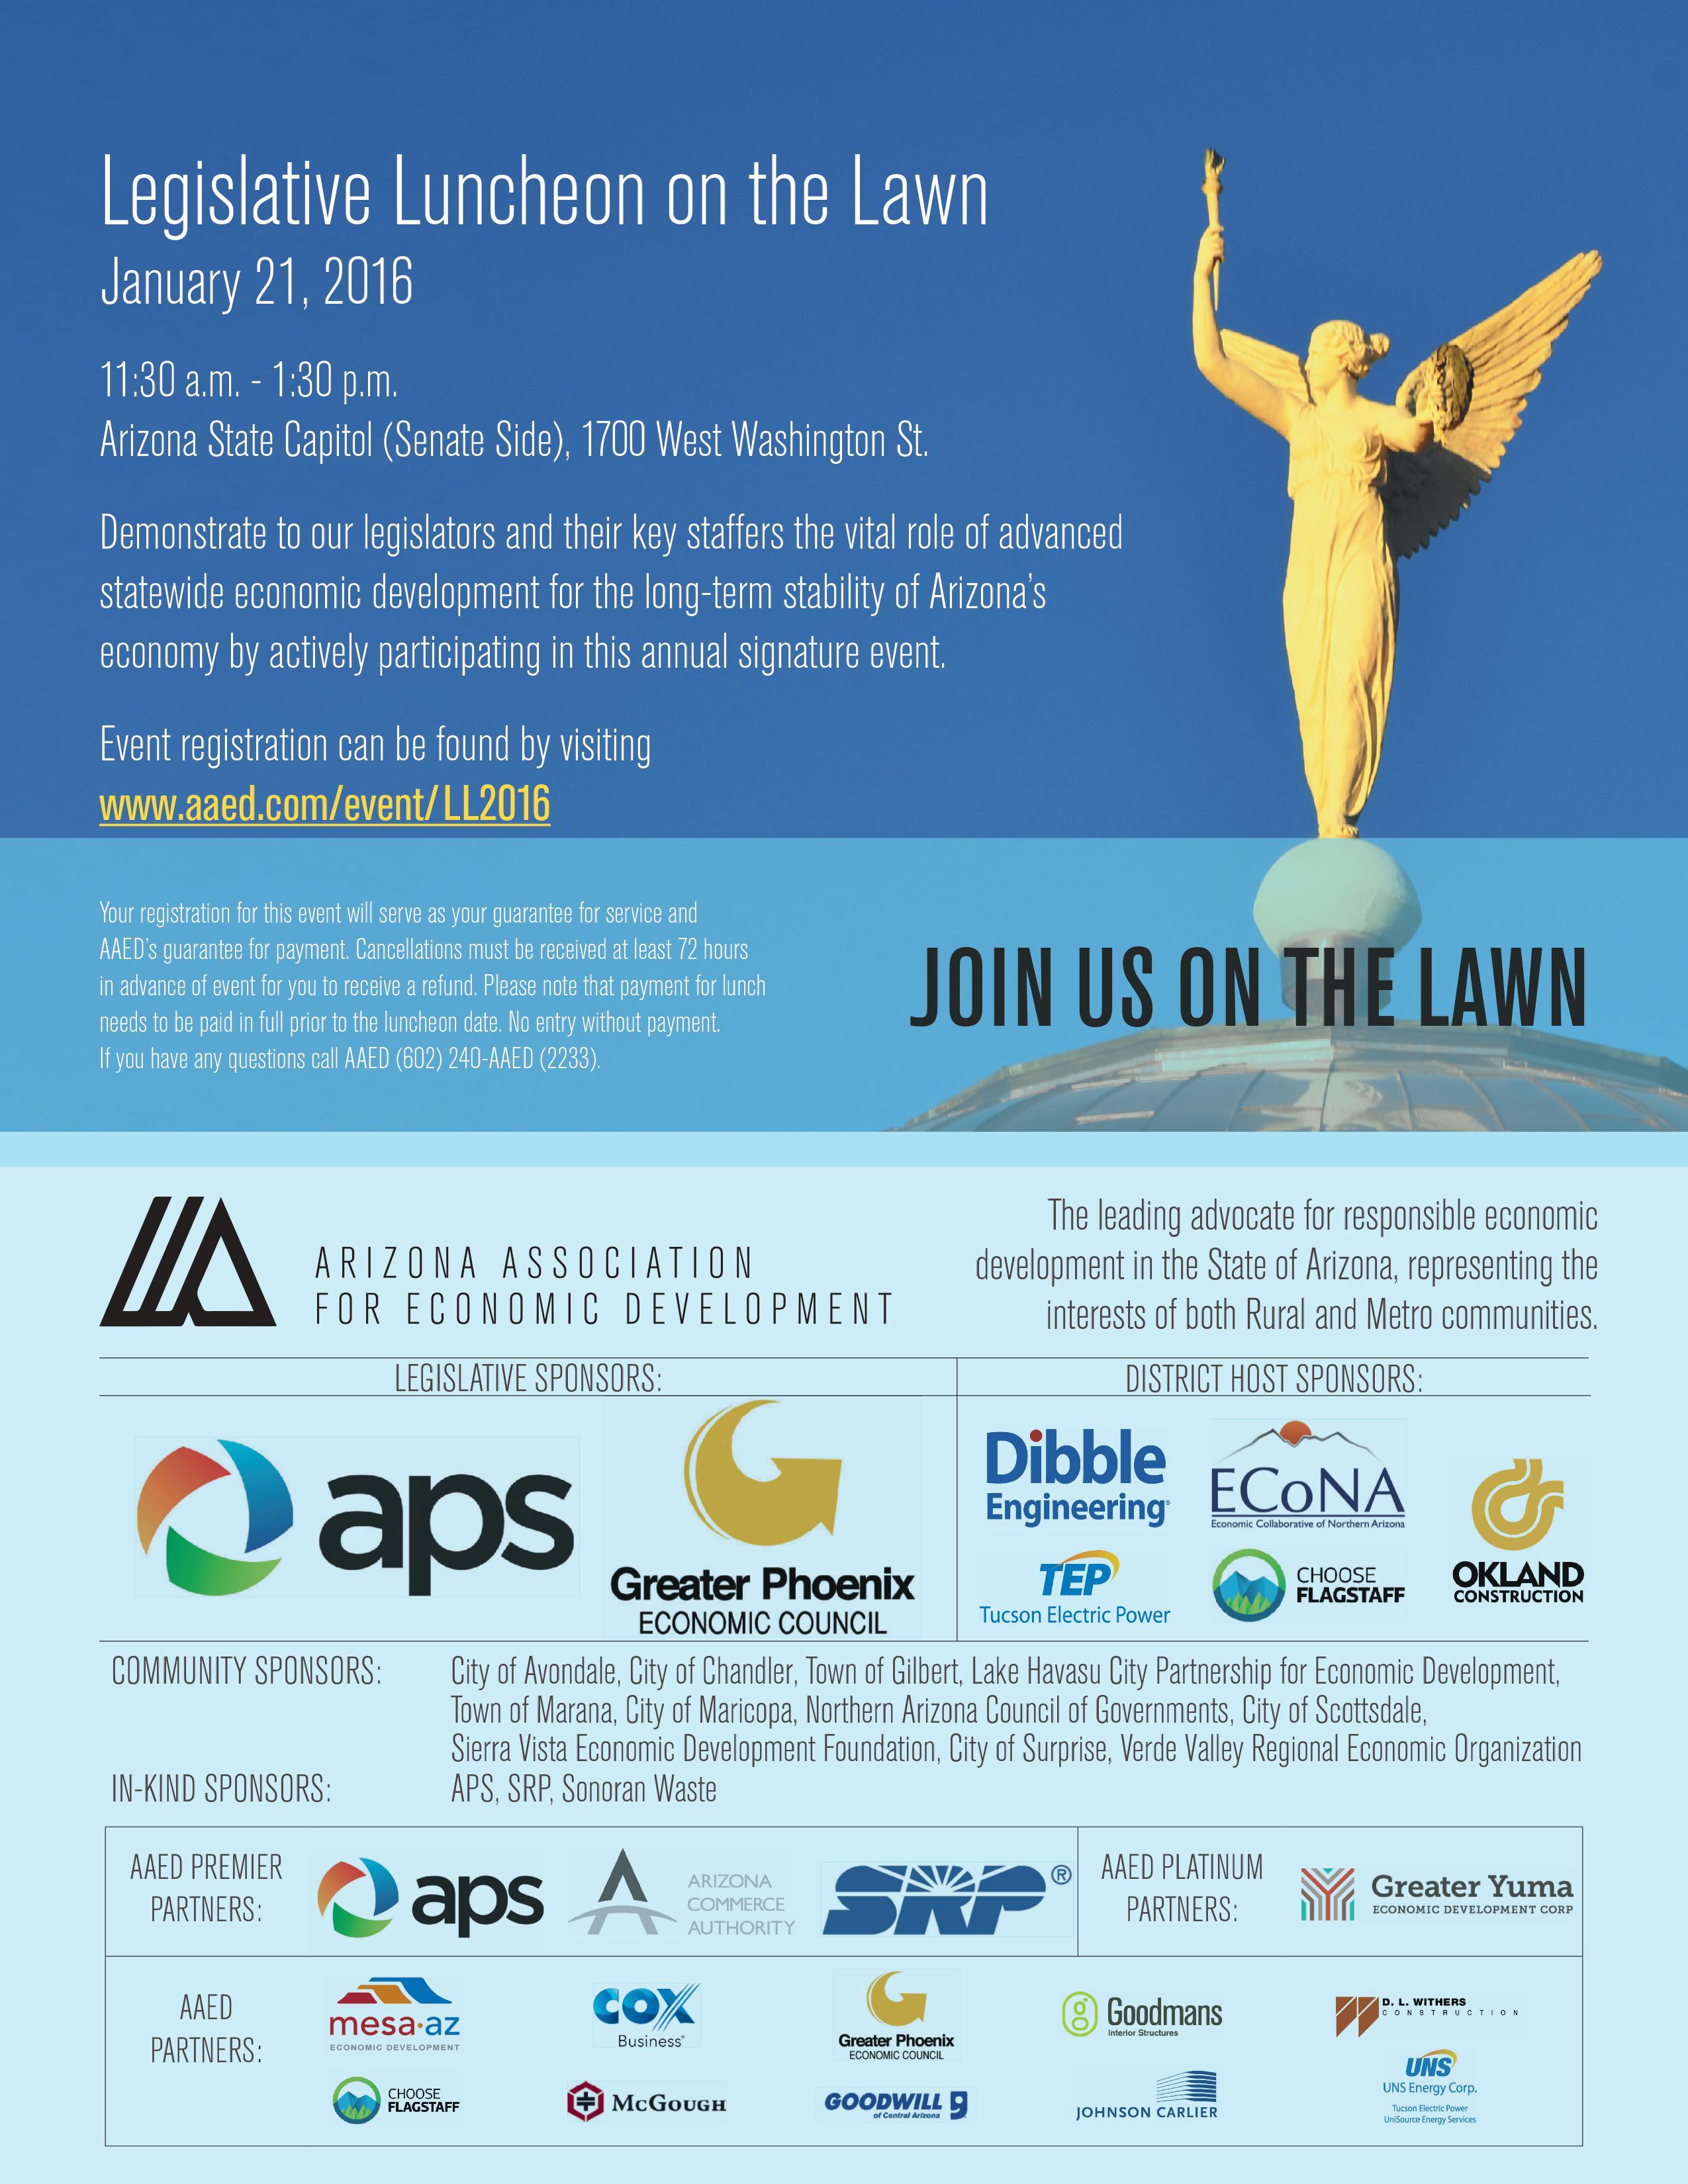 Legislative Luncheon on the Lawn Registration - Arizona Association